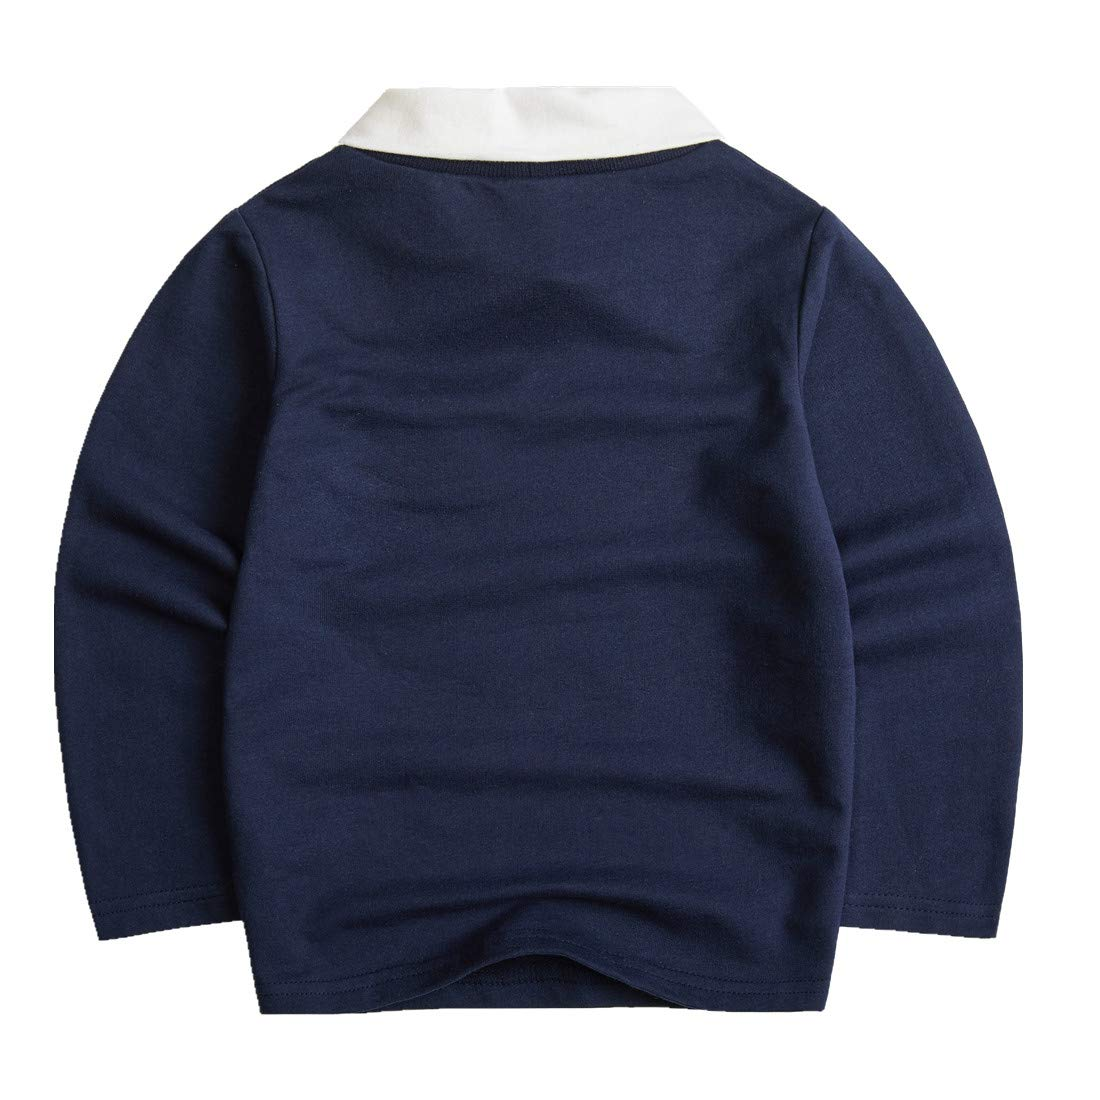 Sooxiwood Little Boys Polo-Shirt Long Sleeve Gentle